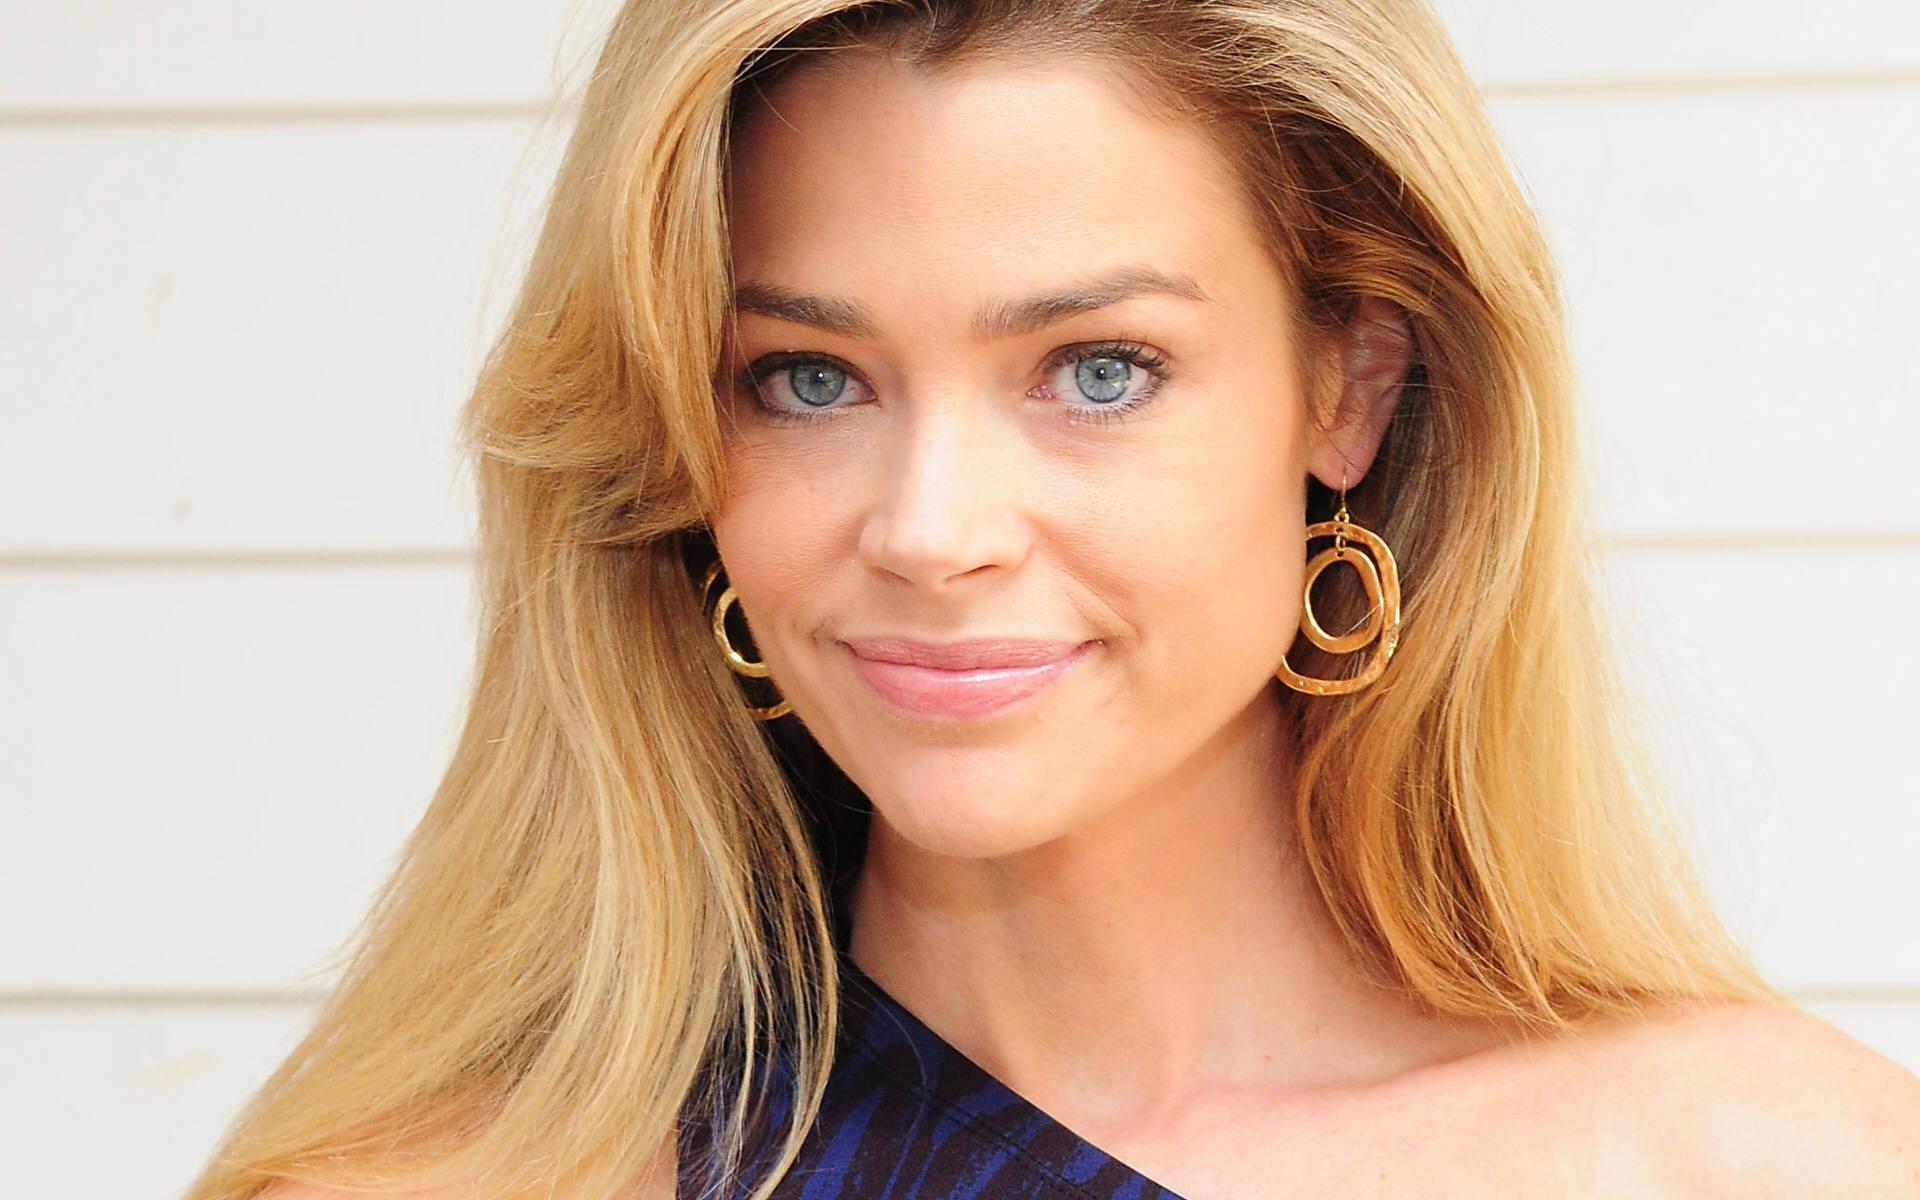 Denise Richards New Smile Pic• PoPoPics.com